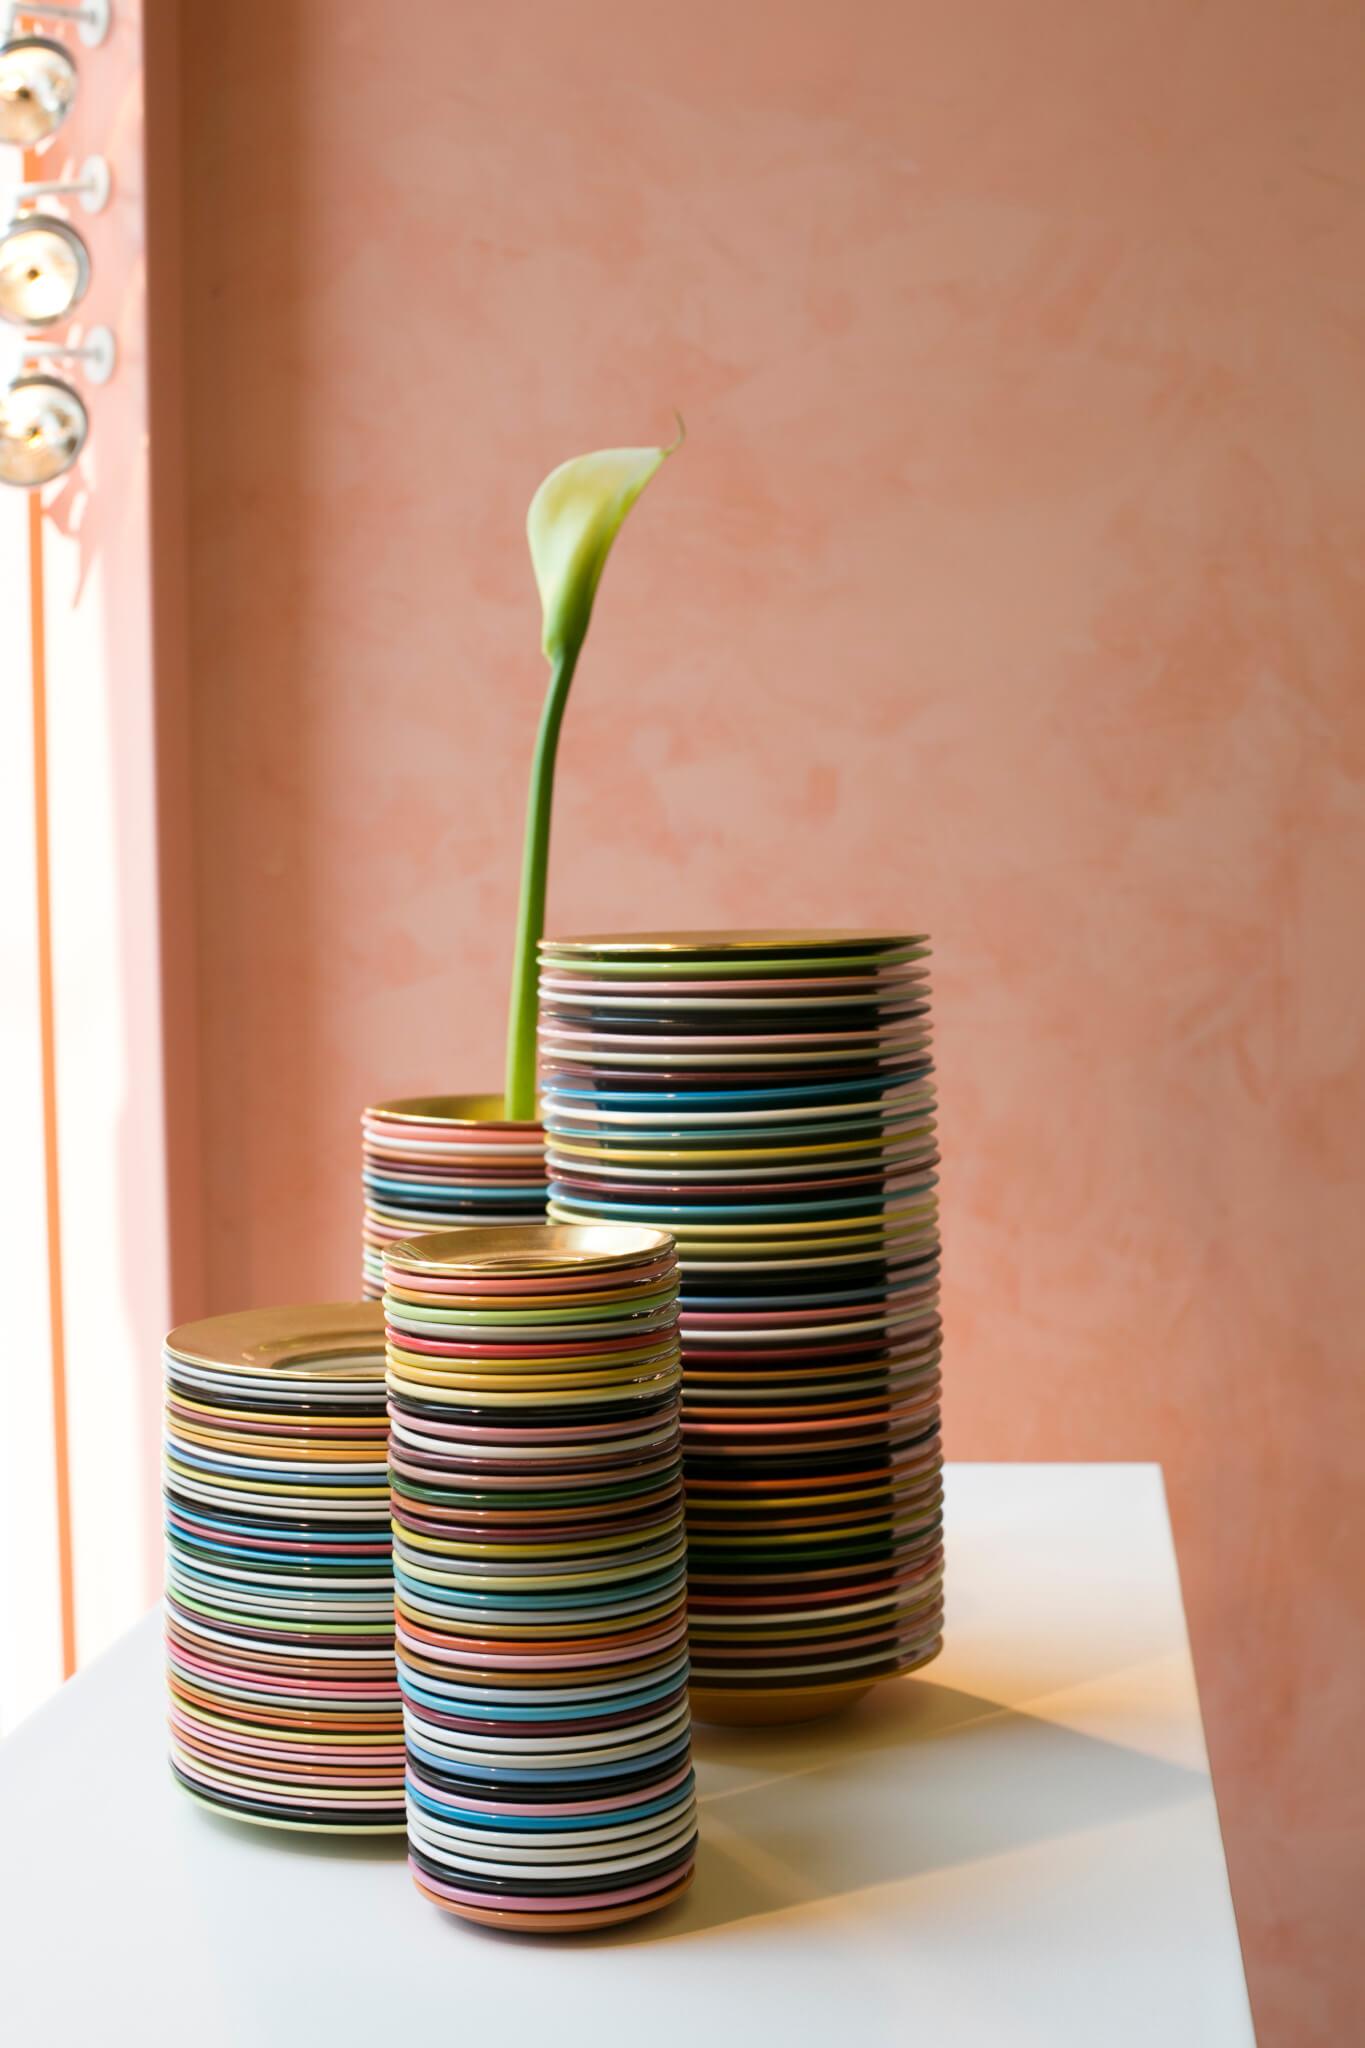 Paul Smith的新花器設計靈感,源自英國陶瓷之都Stoke-on-Trent的傳統製作工序。